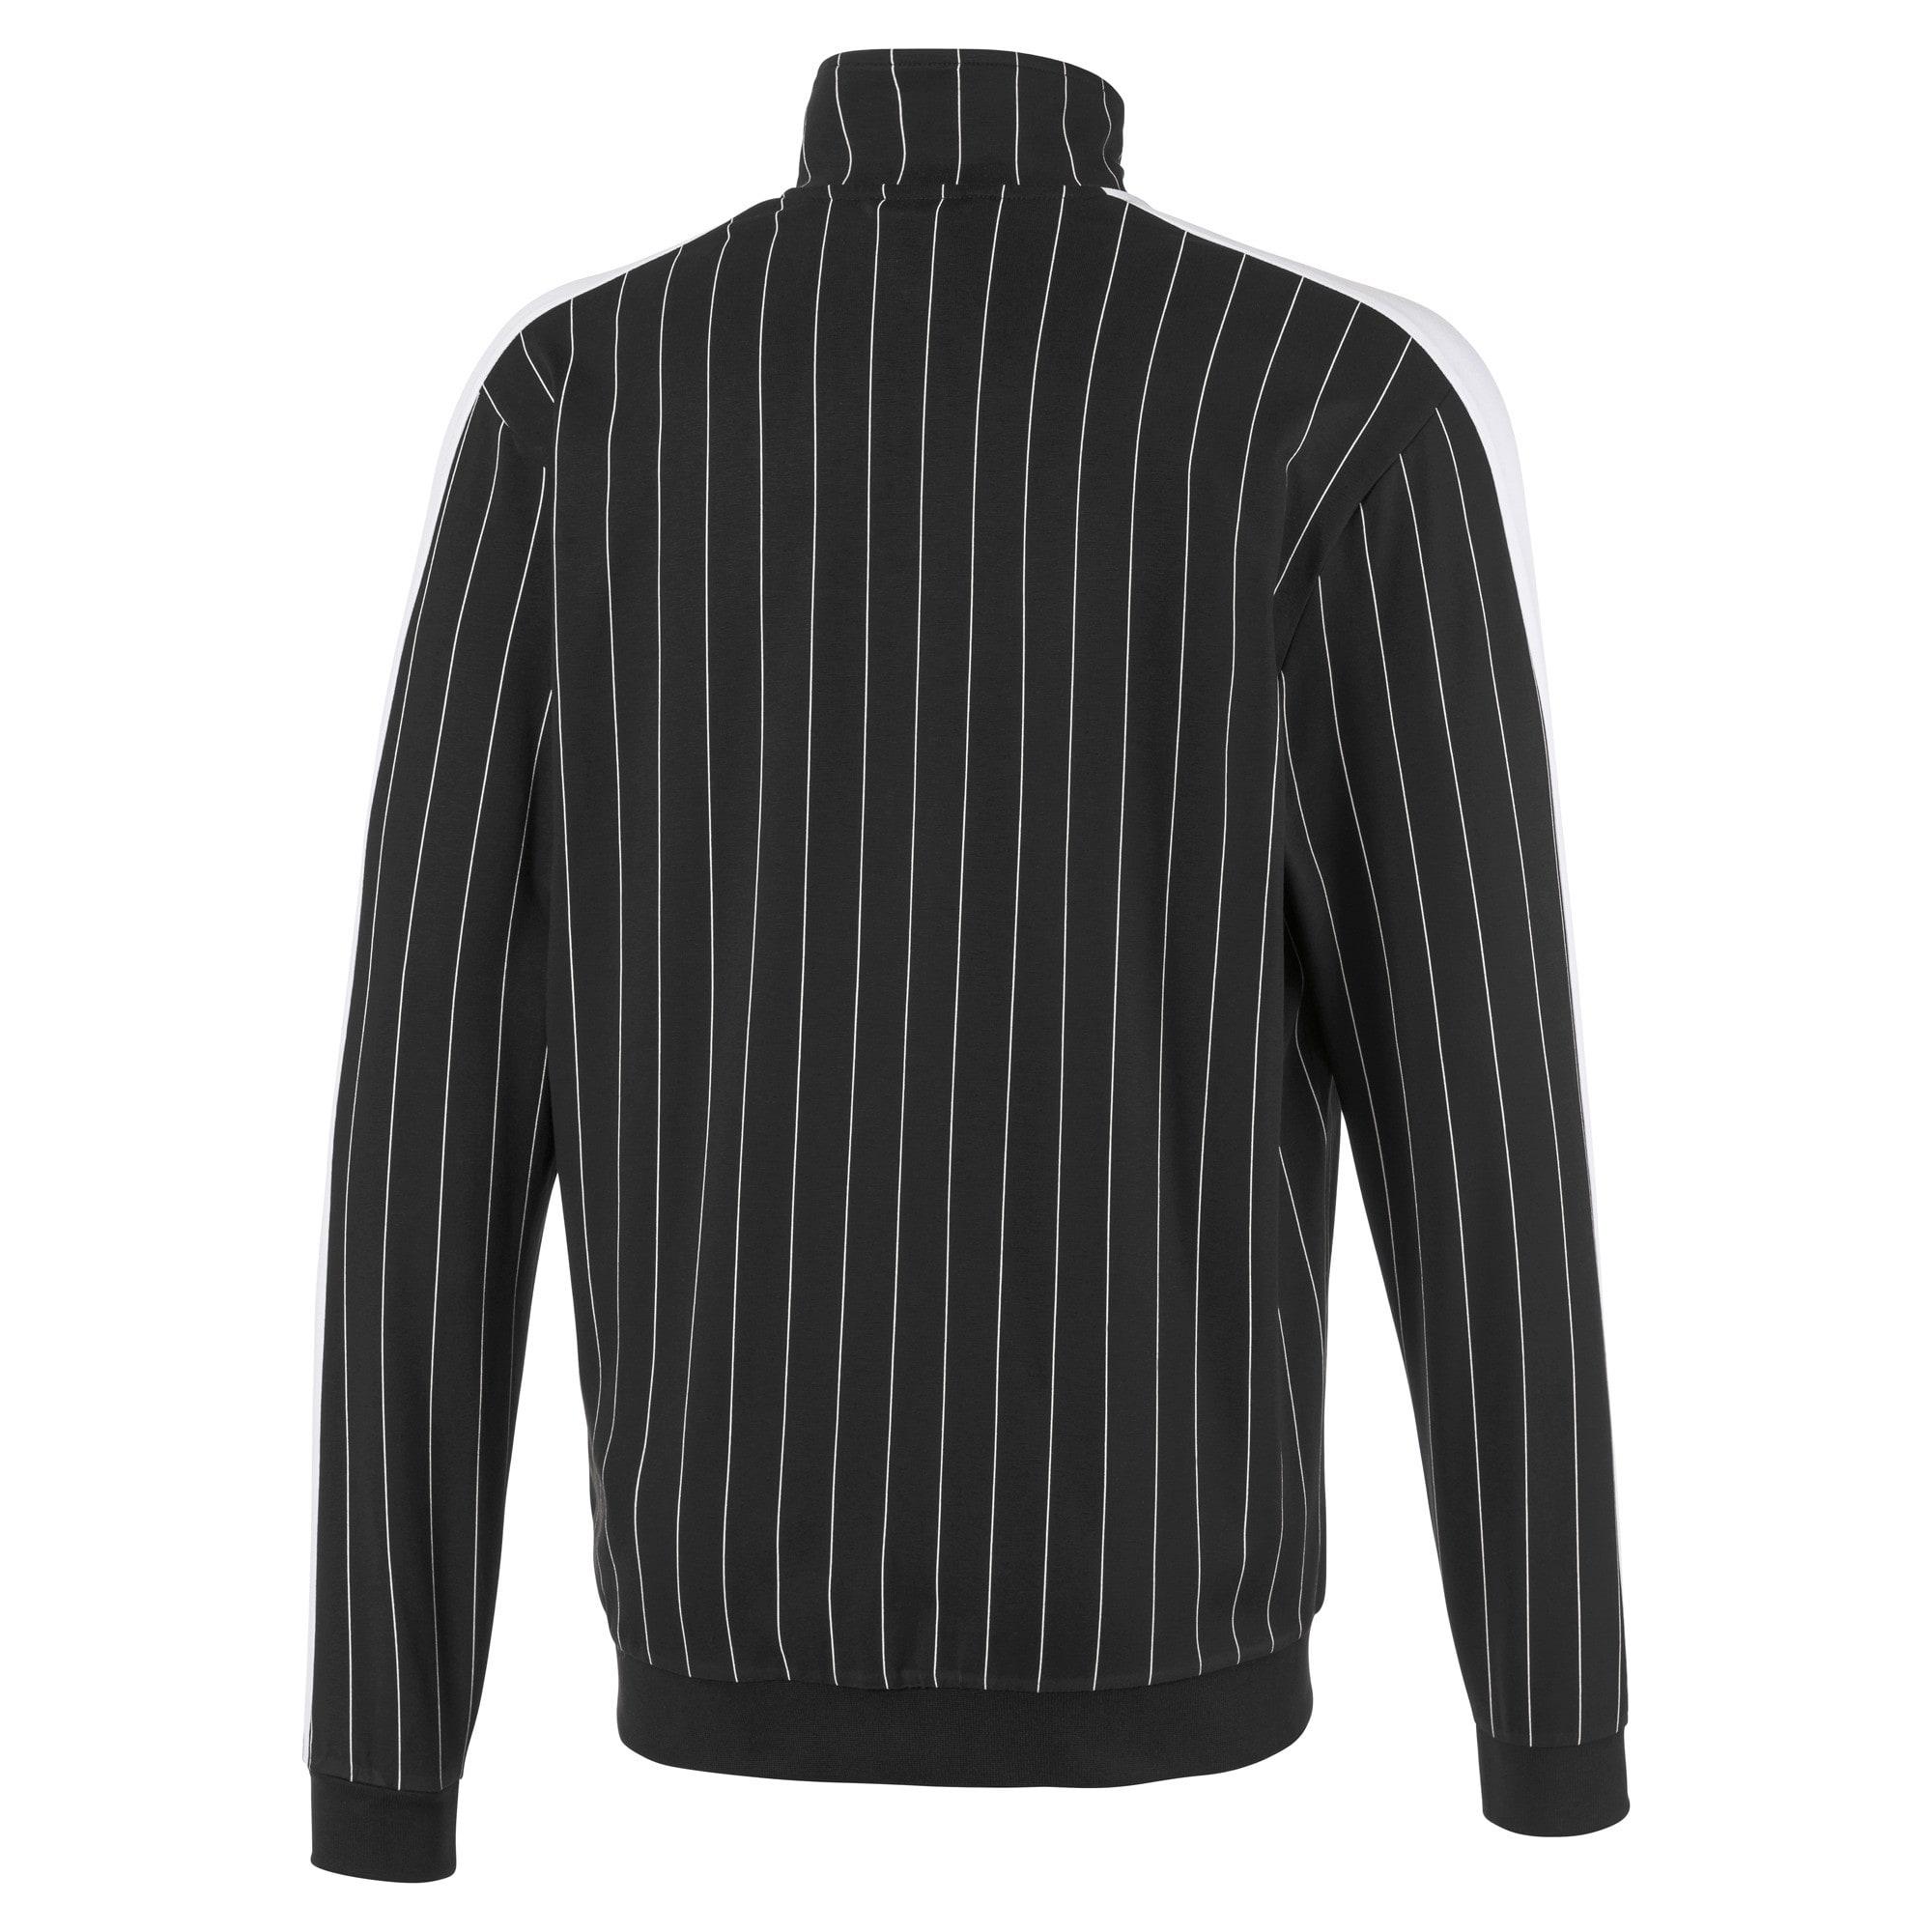 Thumbnail 2 of Archive Pinstripe T7 Men's Track Jacket, Cotton Black, medium